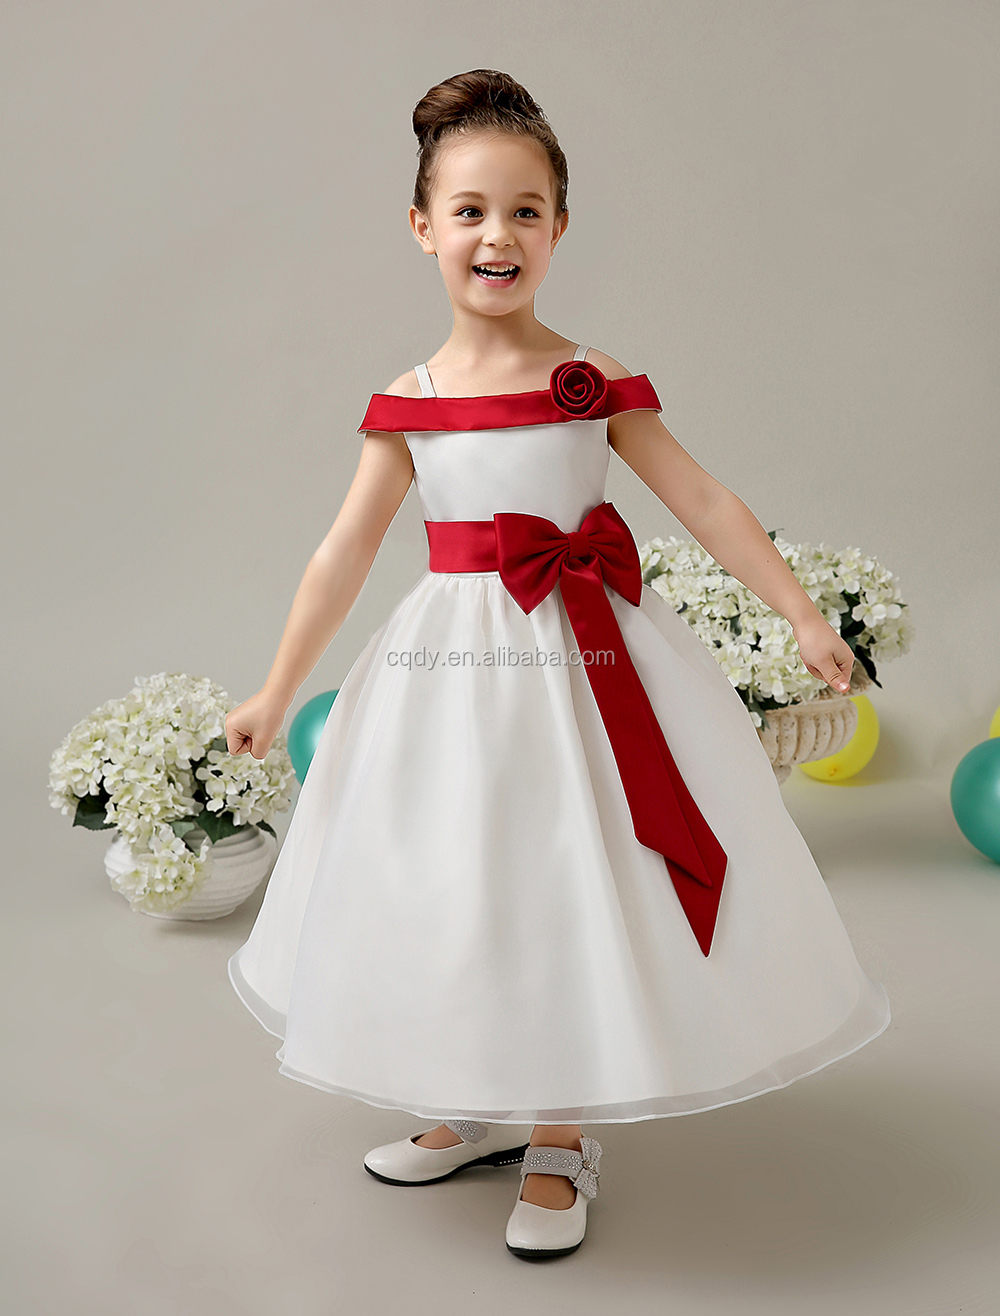 Modern dress advantages - New Arrival 2015 Modern A Line Round Neck Long Flower Girl Dresses Fancy Dresses For Baby